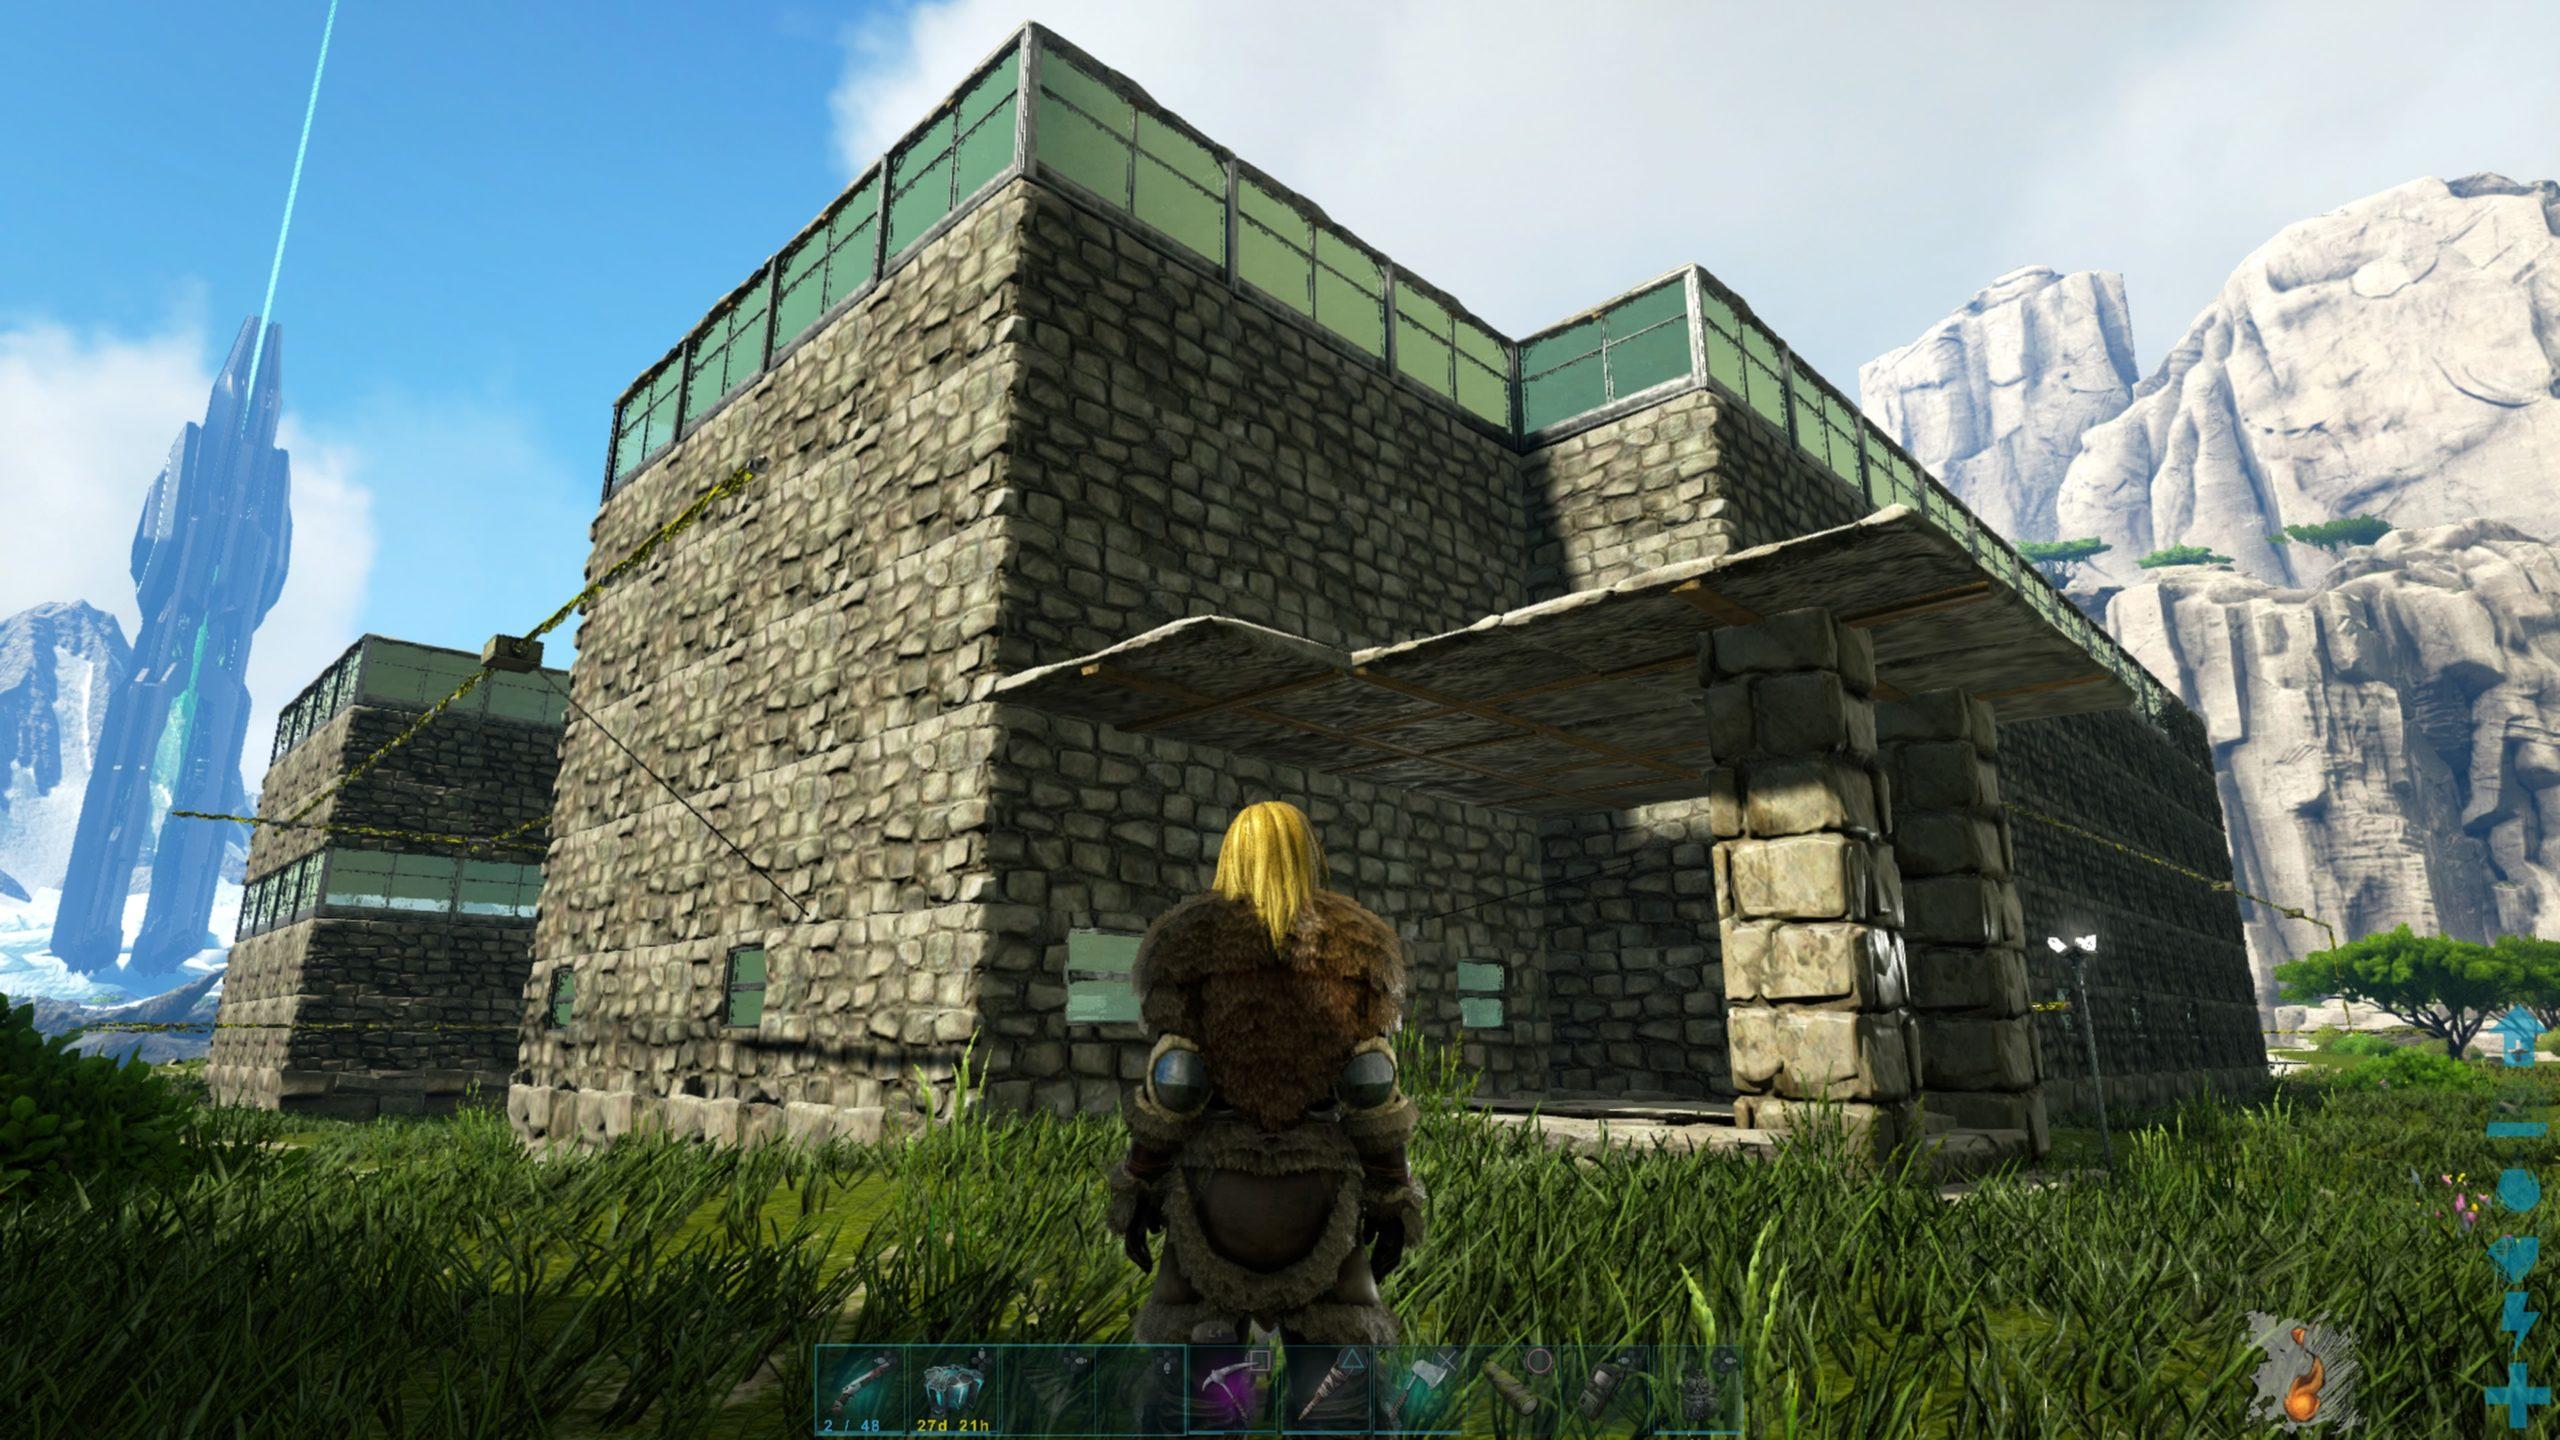 Ark バルゲロ 拠点 ARK【PS4】バルゲロ拠点完成!素材集めのおすすめスポットを紹介